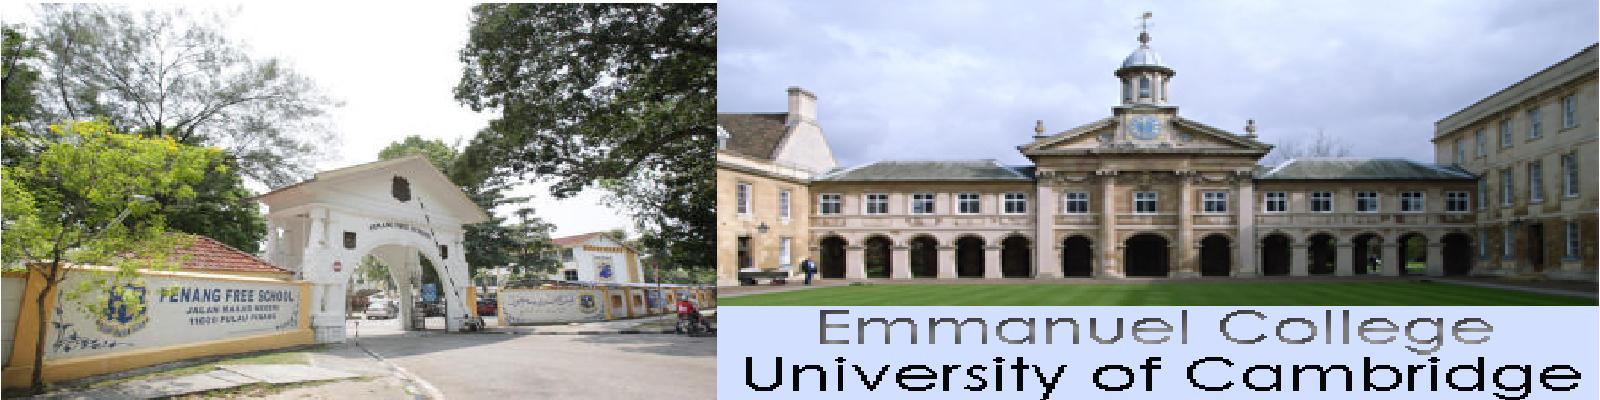 Penang Free School and Emmanuel College